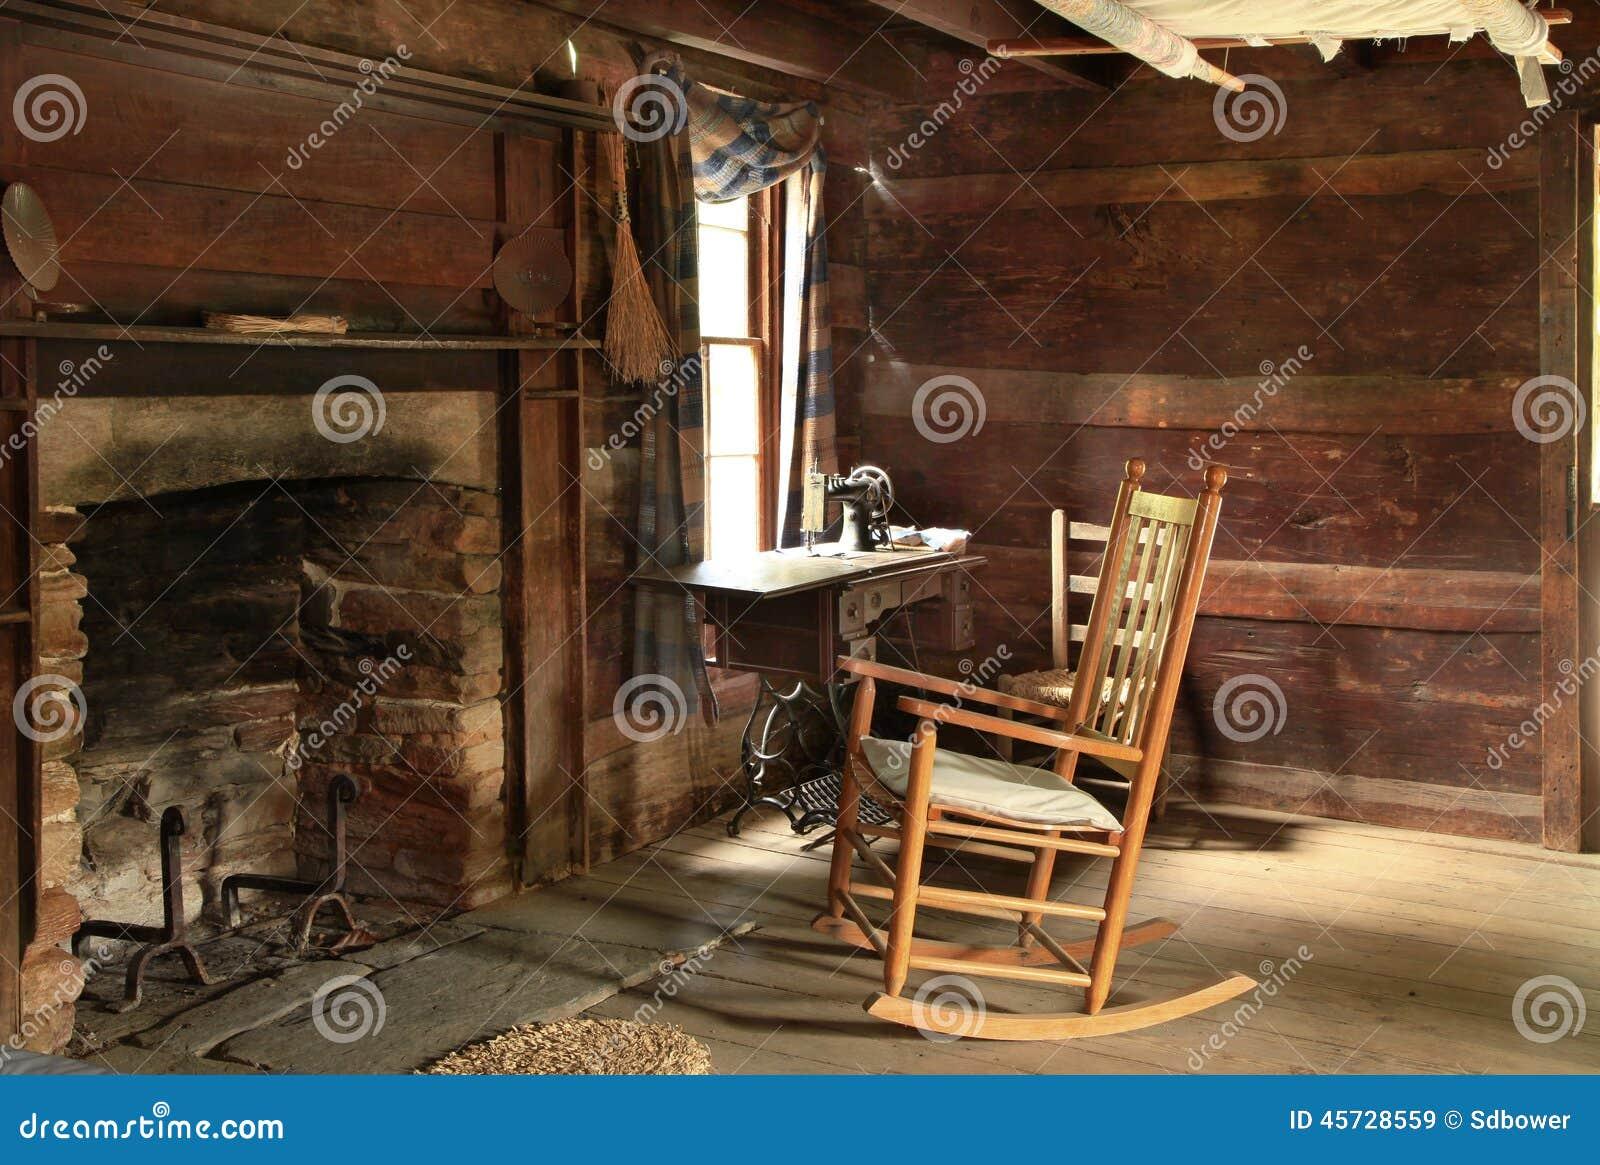 Dark Interior Of Old Log Cabin Built In The 1800s Stock